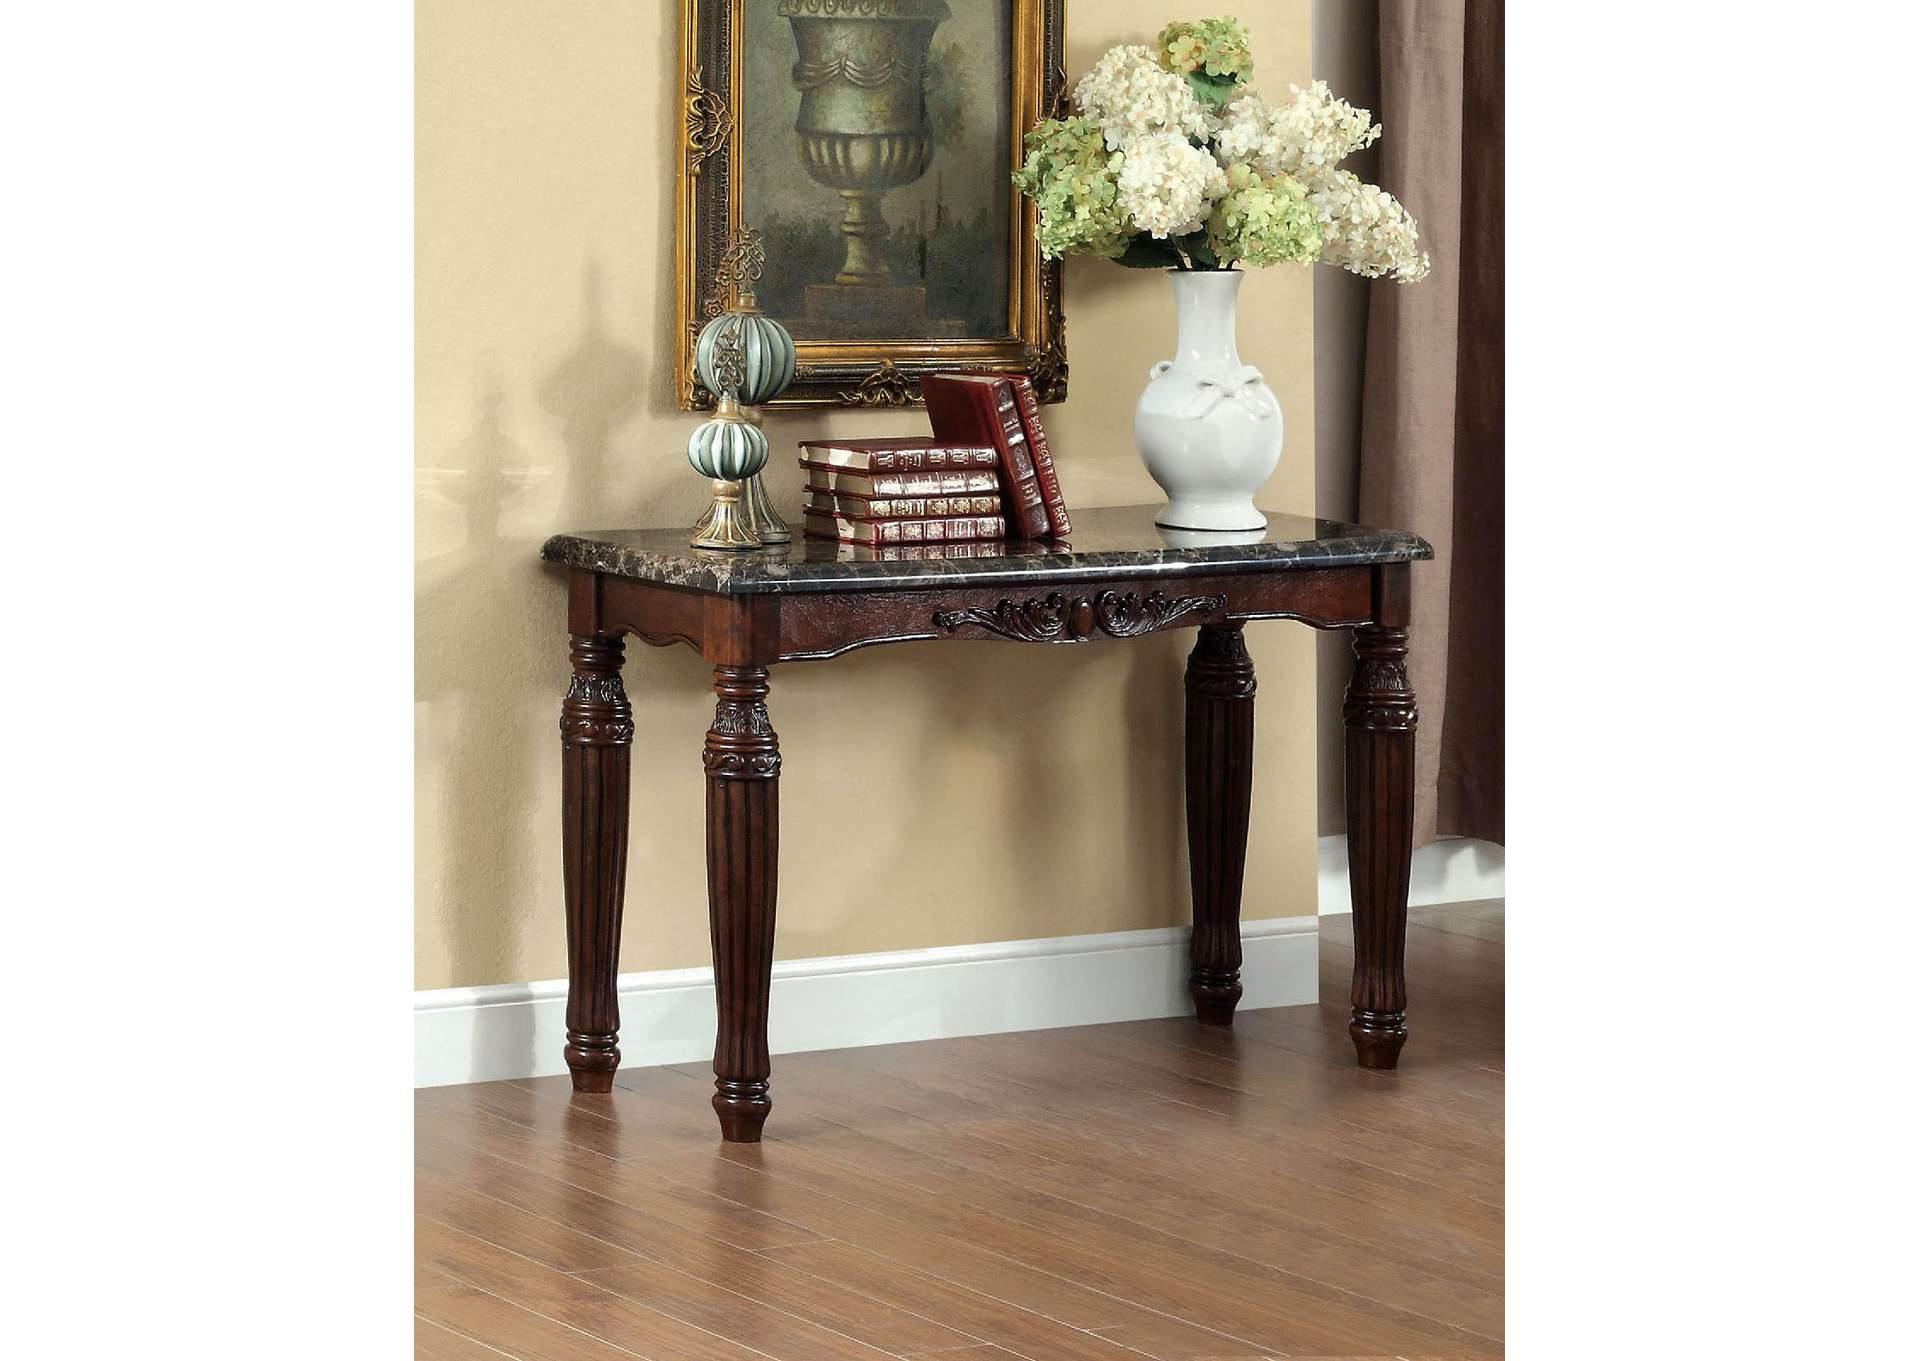 star furniture sofa table chaise longue bed canada max five brampton dark walnut w faux marble top of america